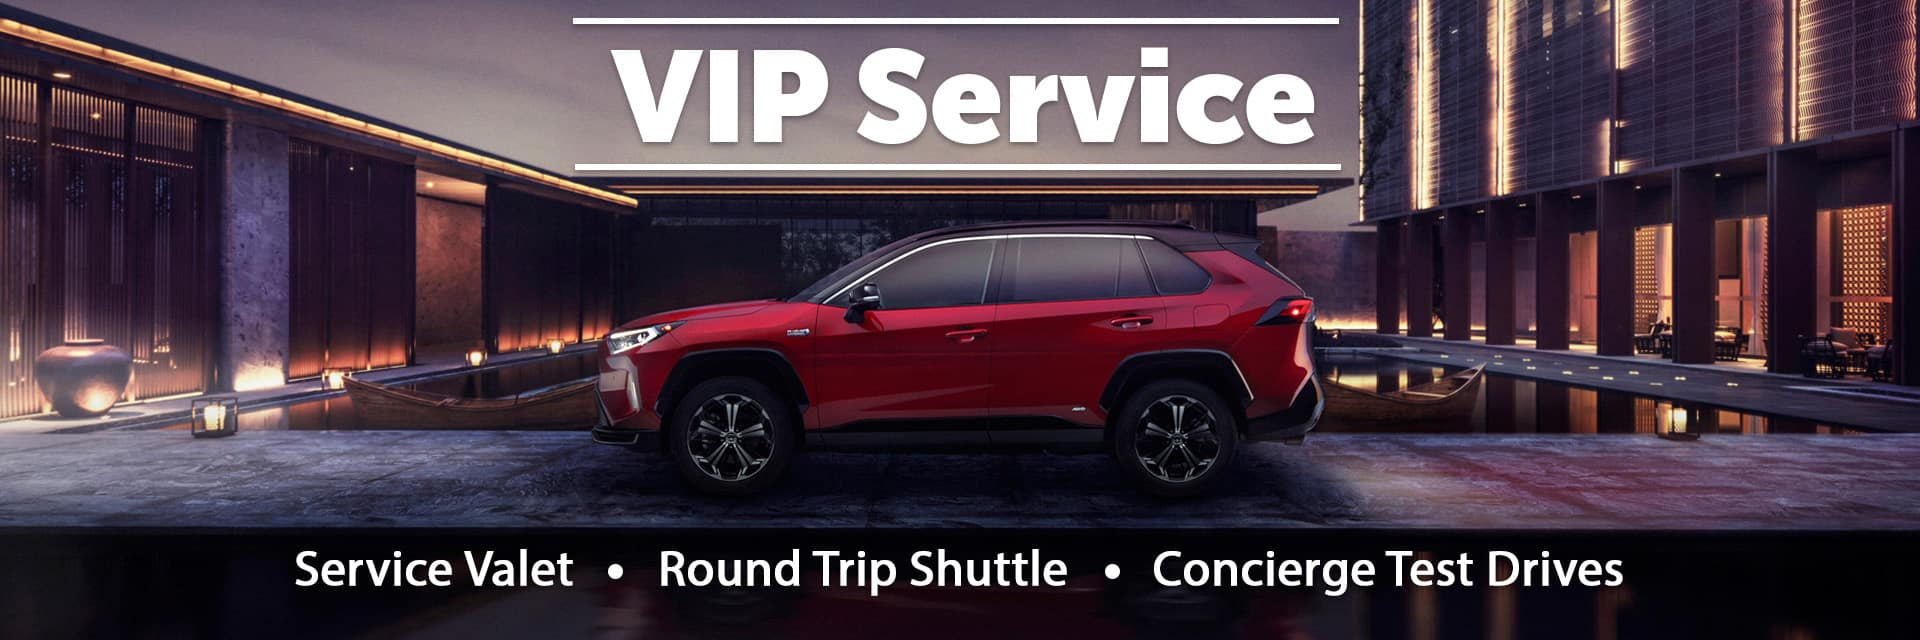 VIP Service Slider